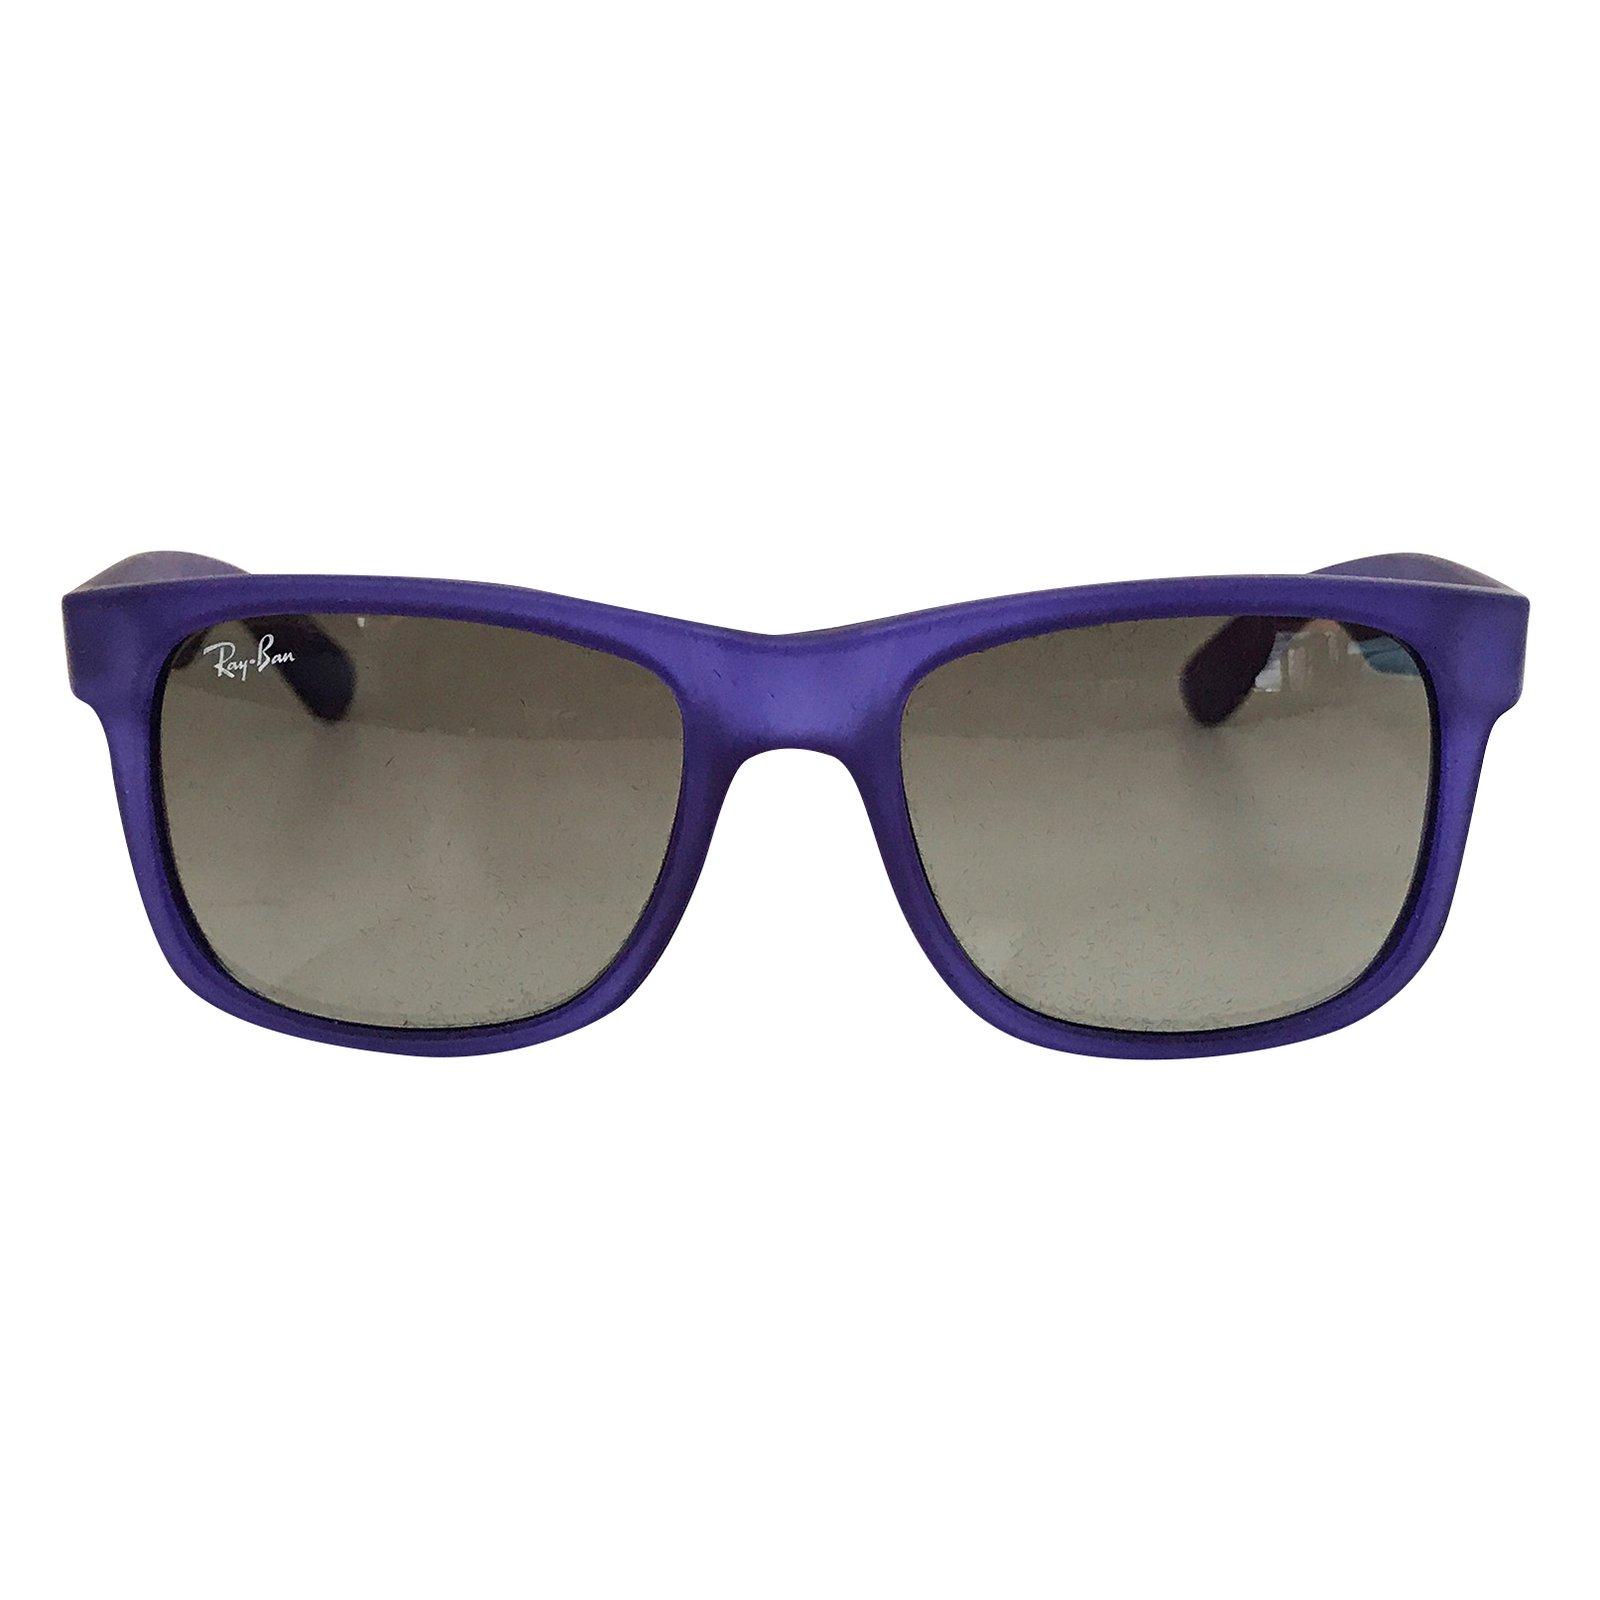 lunettes ray ban justin plastique bleu joli closet. Black Bedroom Furniture Sets. Home Design Ideas